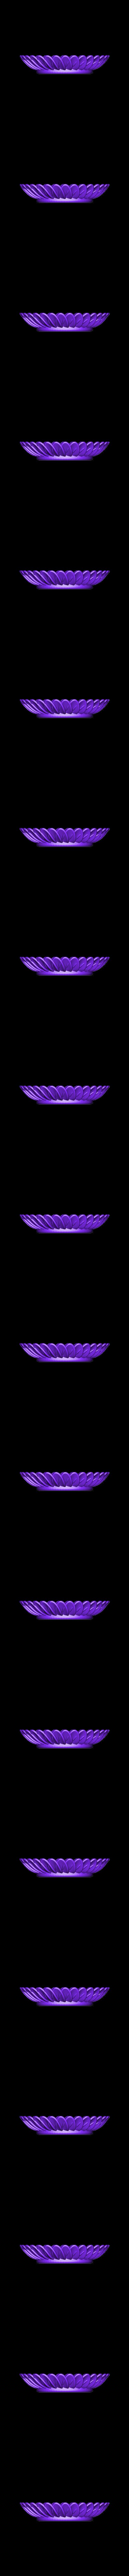 p_tales_tournesol_n_2.STL Download free STL file Fleurs • 3D print design, Etienne